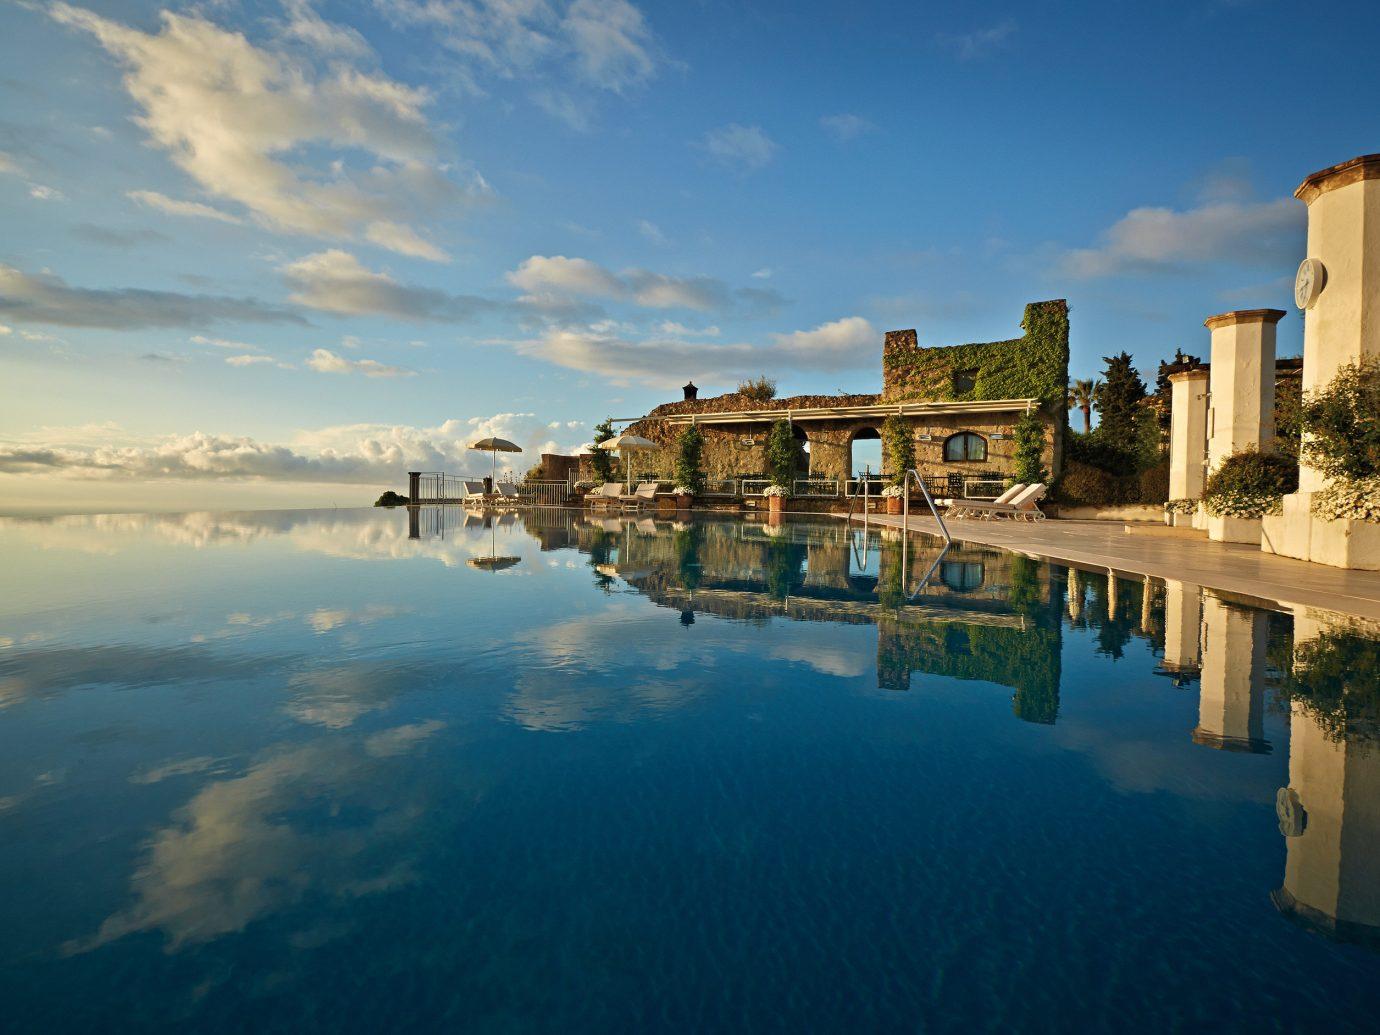 infinity pool at Belmond Hotel Caruso, Ravello